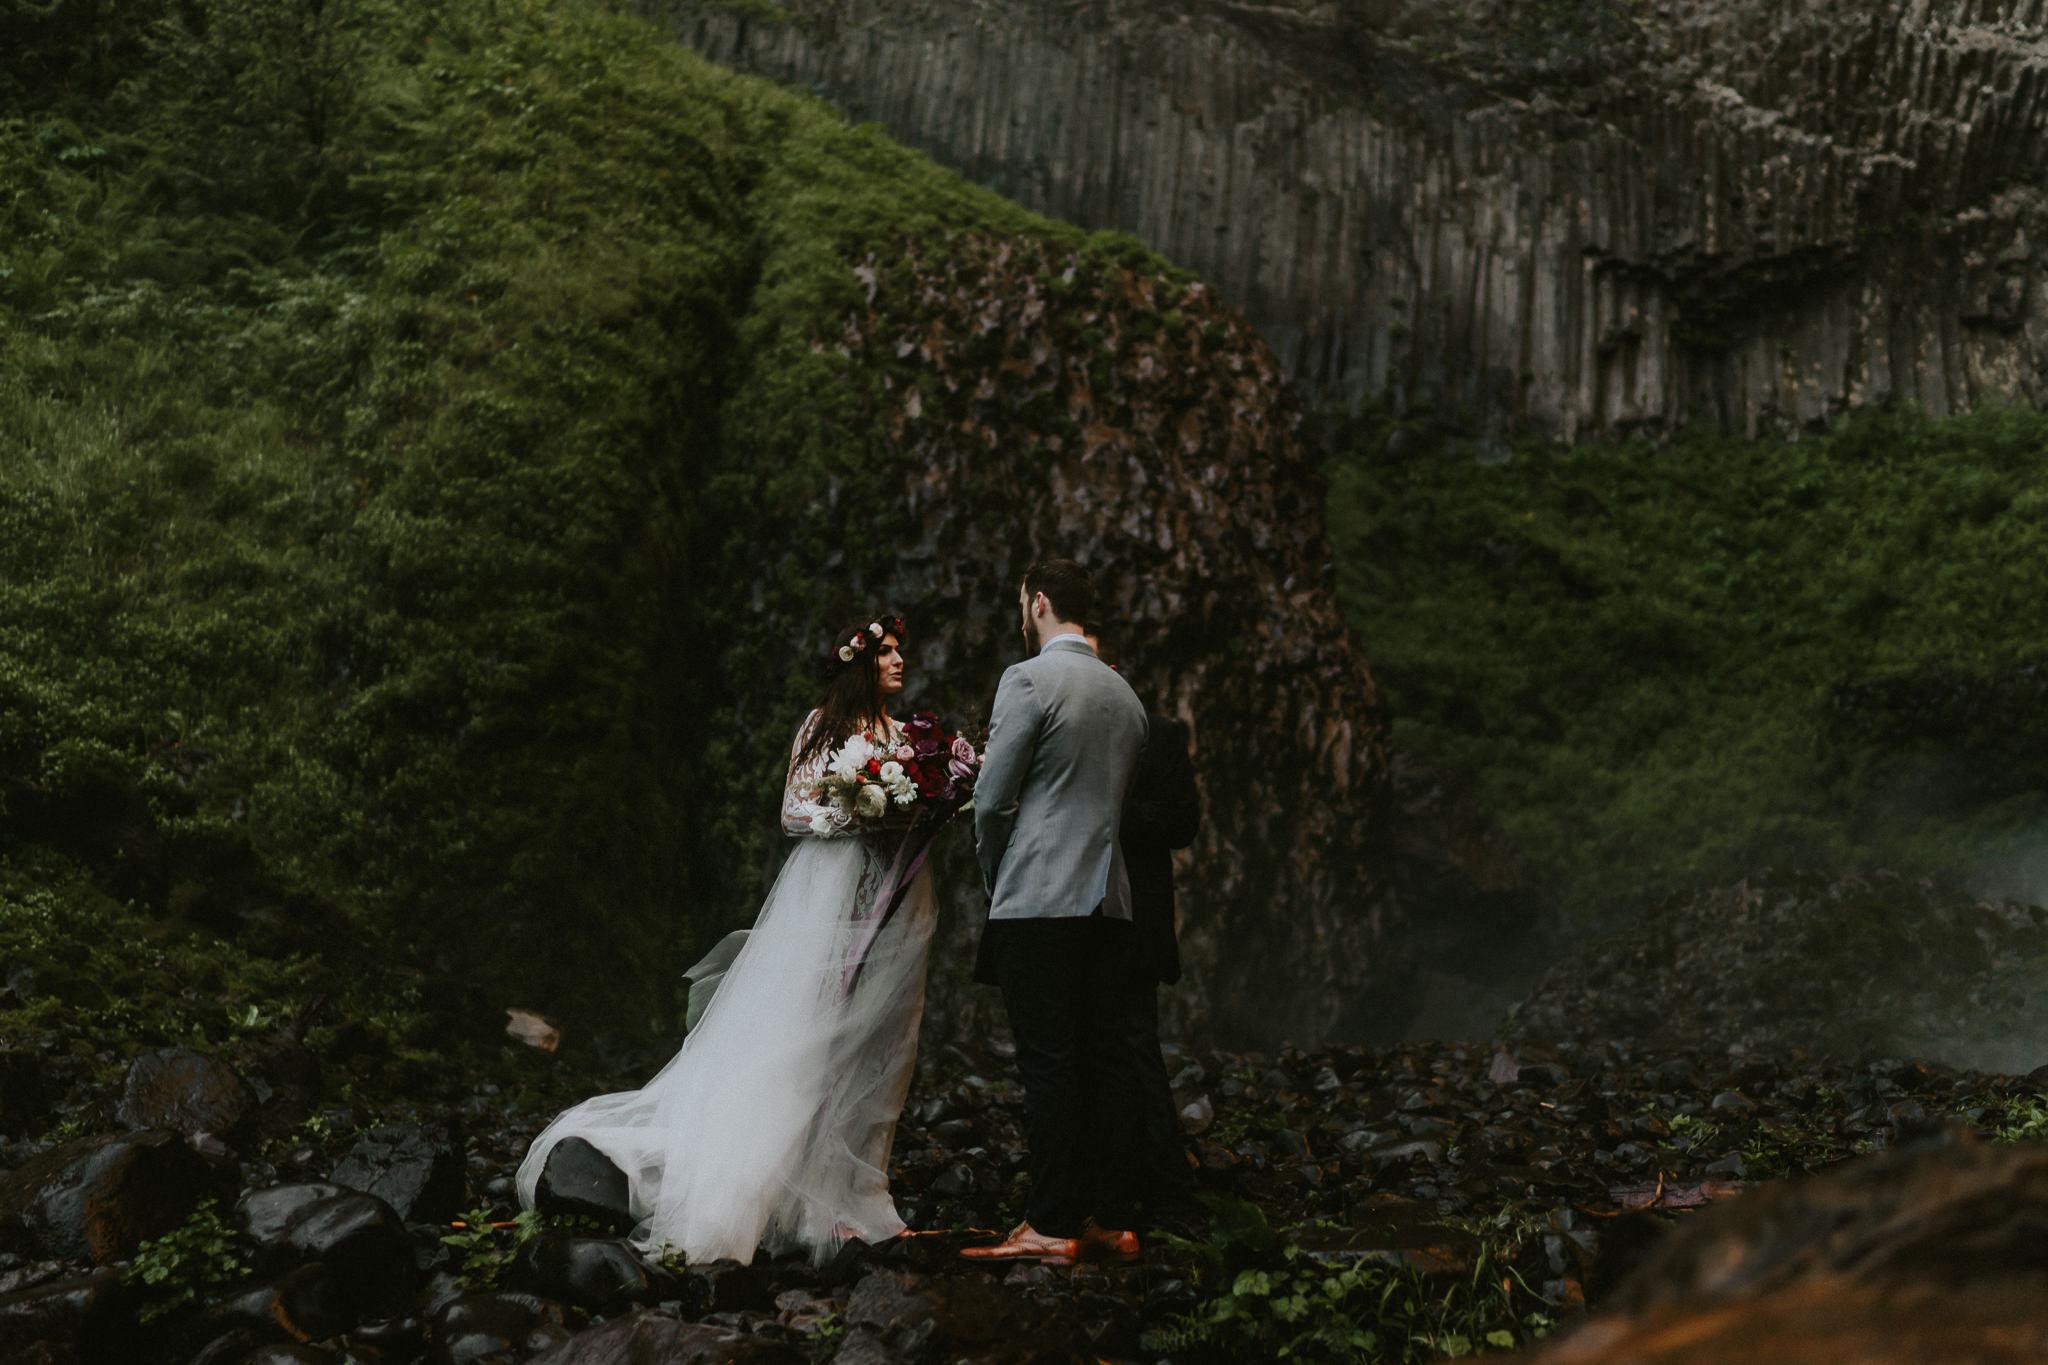 Tribes-Pines-Florals-Waterfalls-Elopement-wedding-Photographer